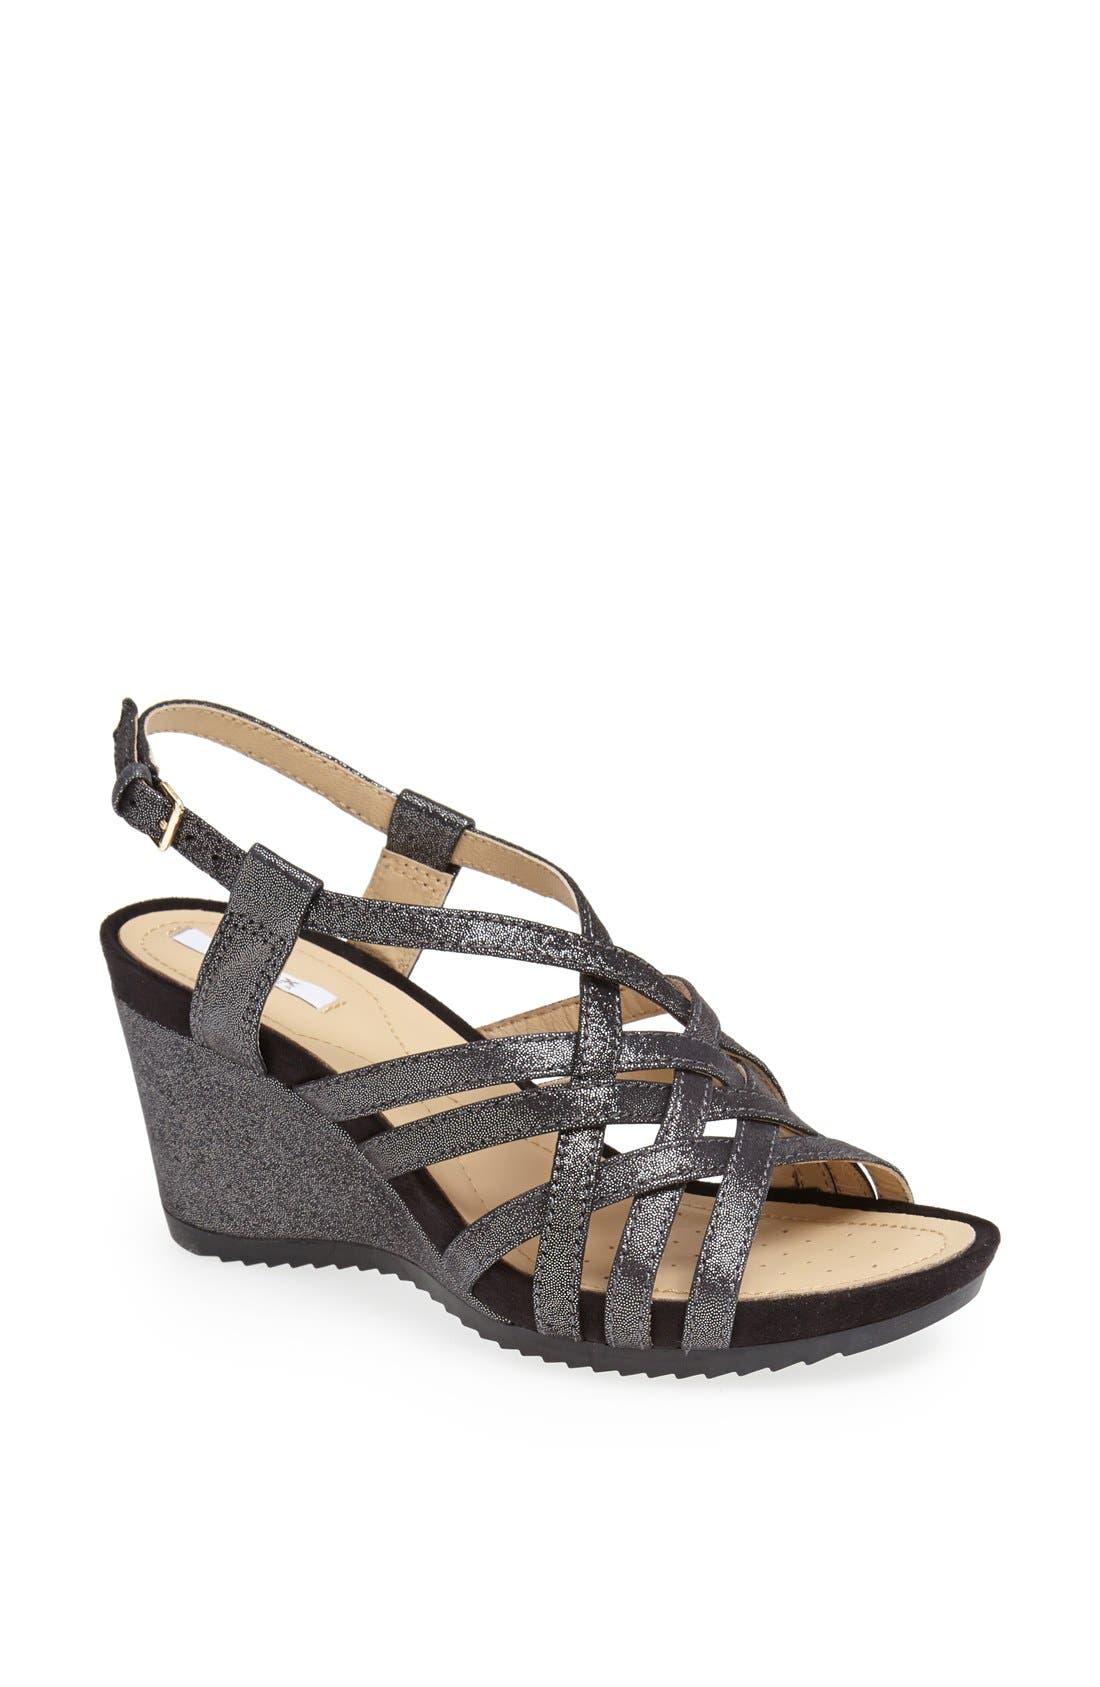 Main Image - Geox 'Roxy' Metallic Leather Sandal (Women)